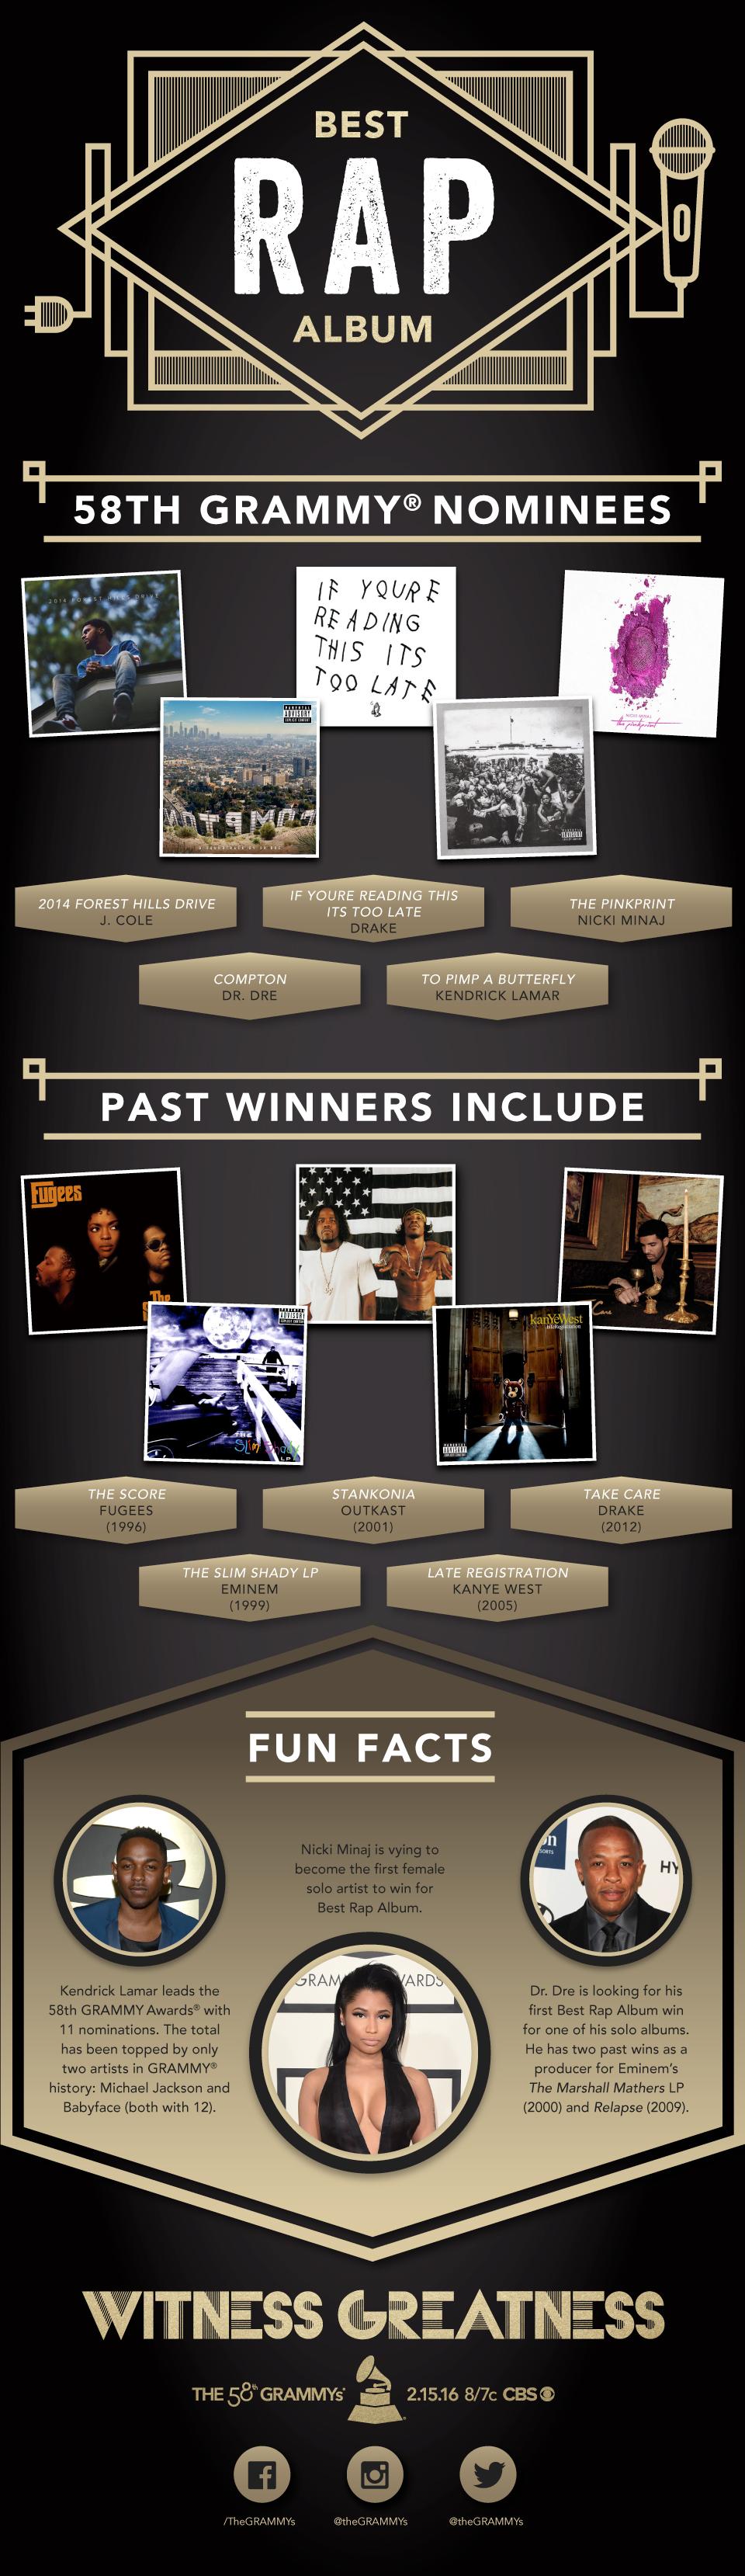 Best Rap Album: Meet The 58th GRAMMY Nominees